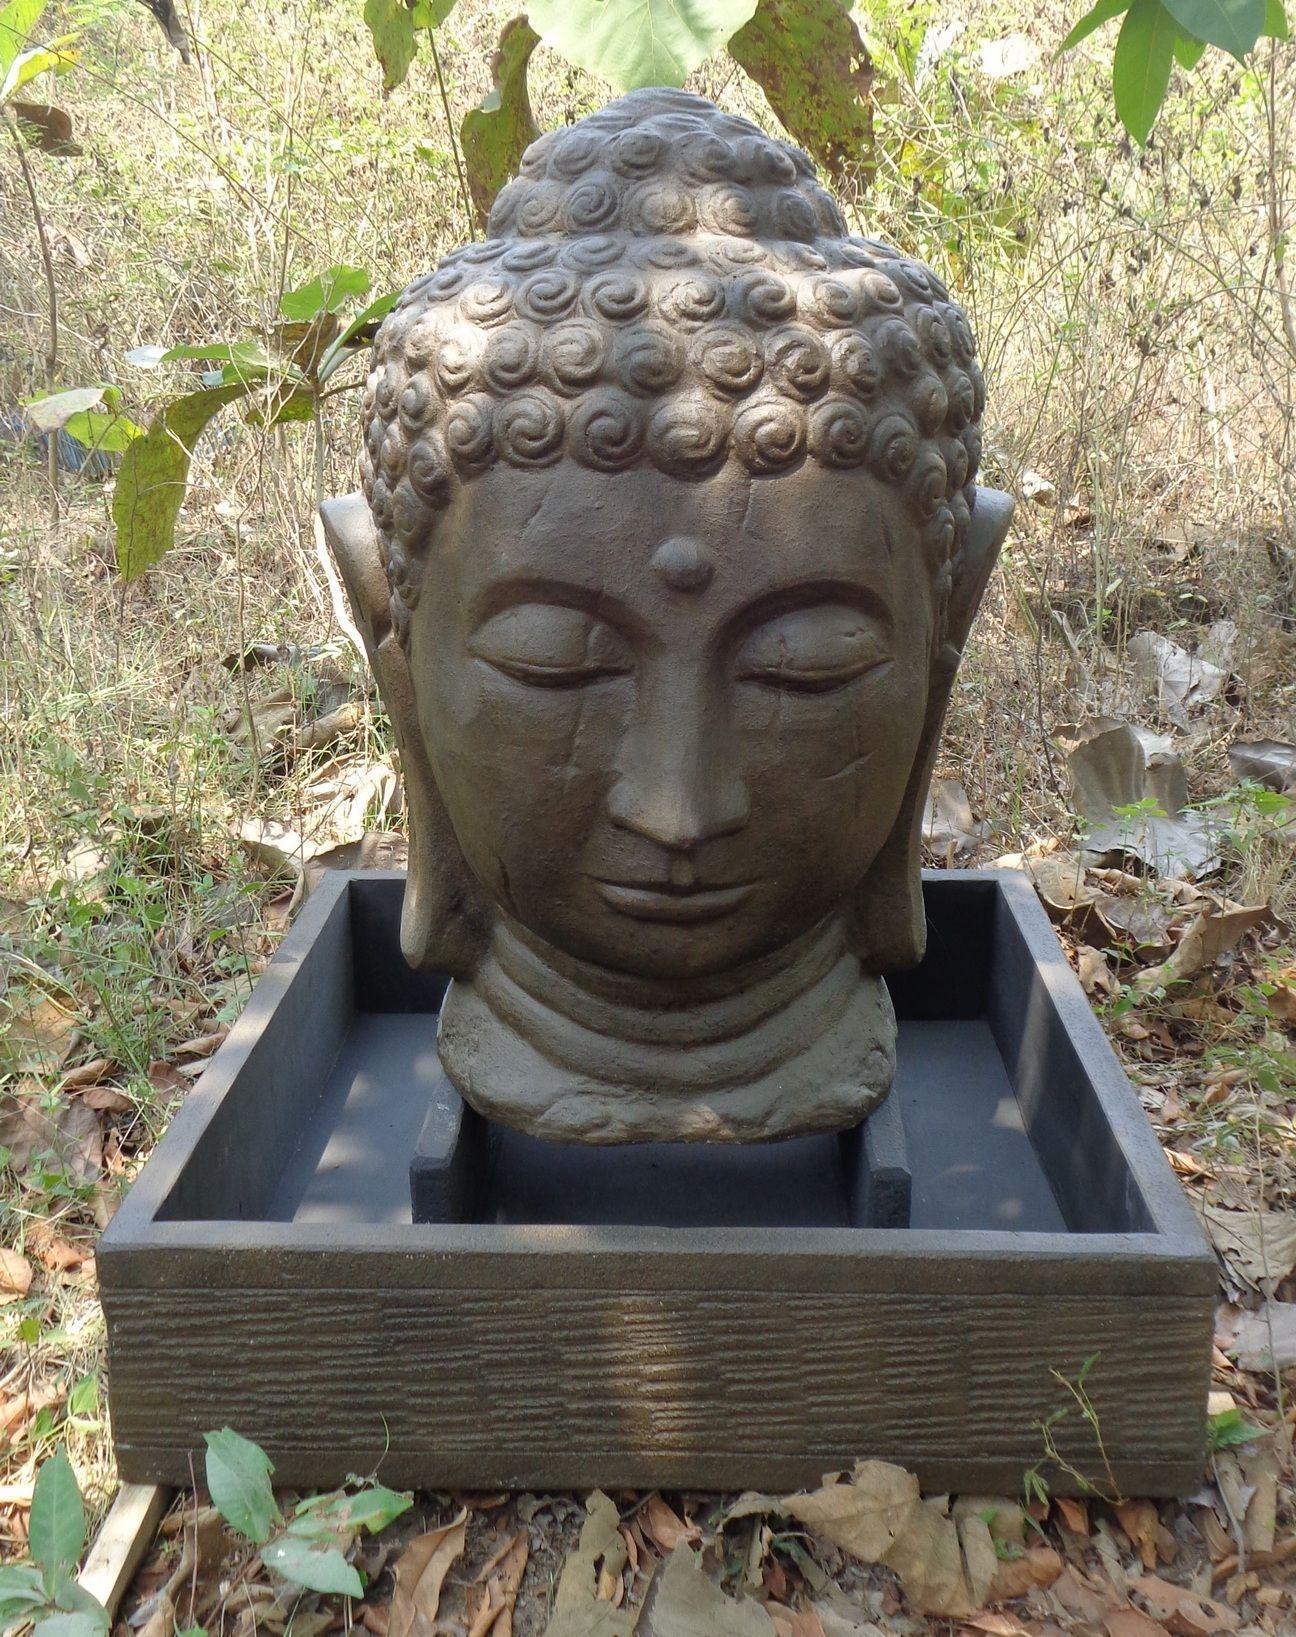 Fontaine de jardin t te de bouddha 1 m 30 brun - Statue bouddha pour jardin ...